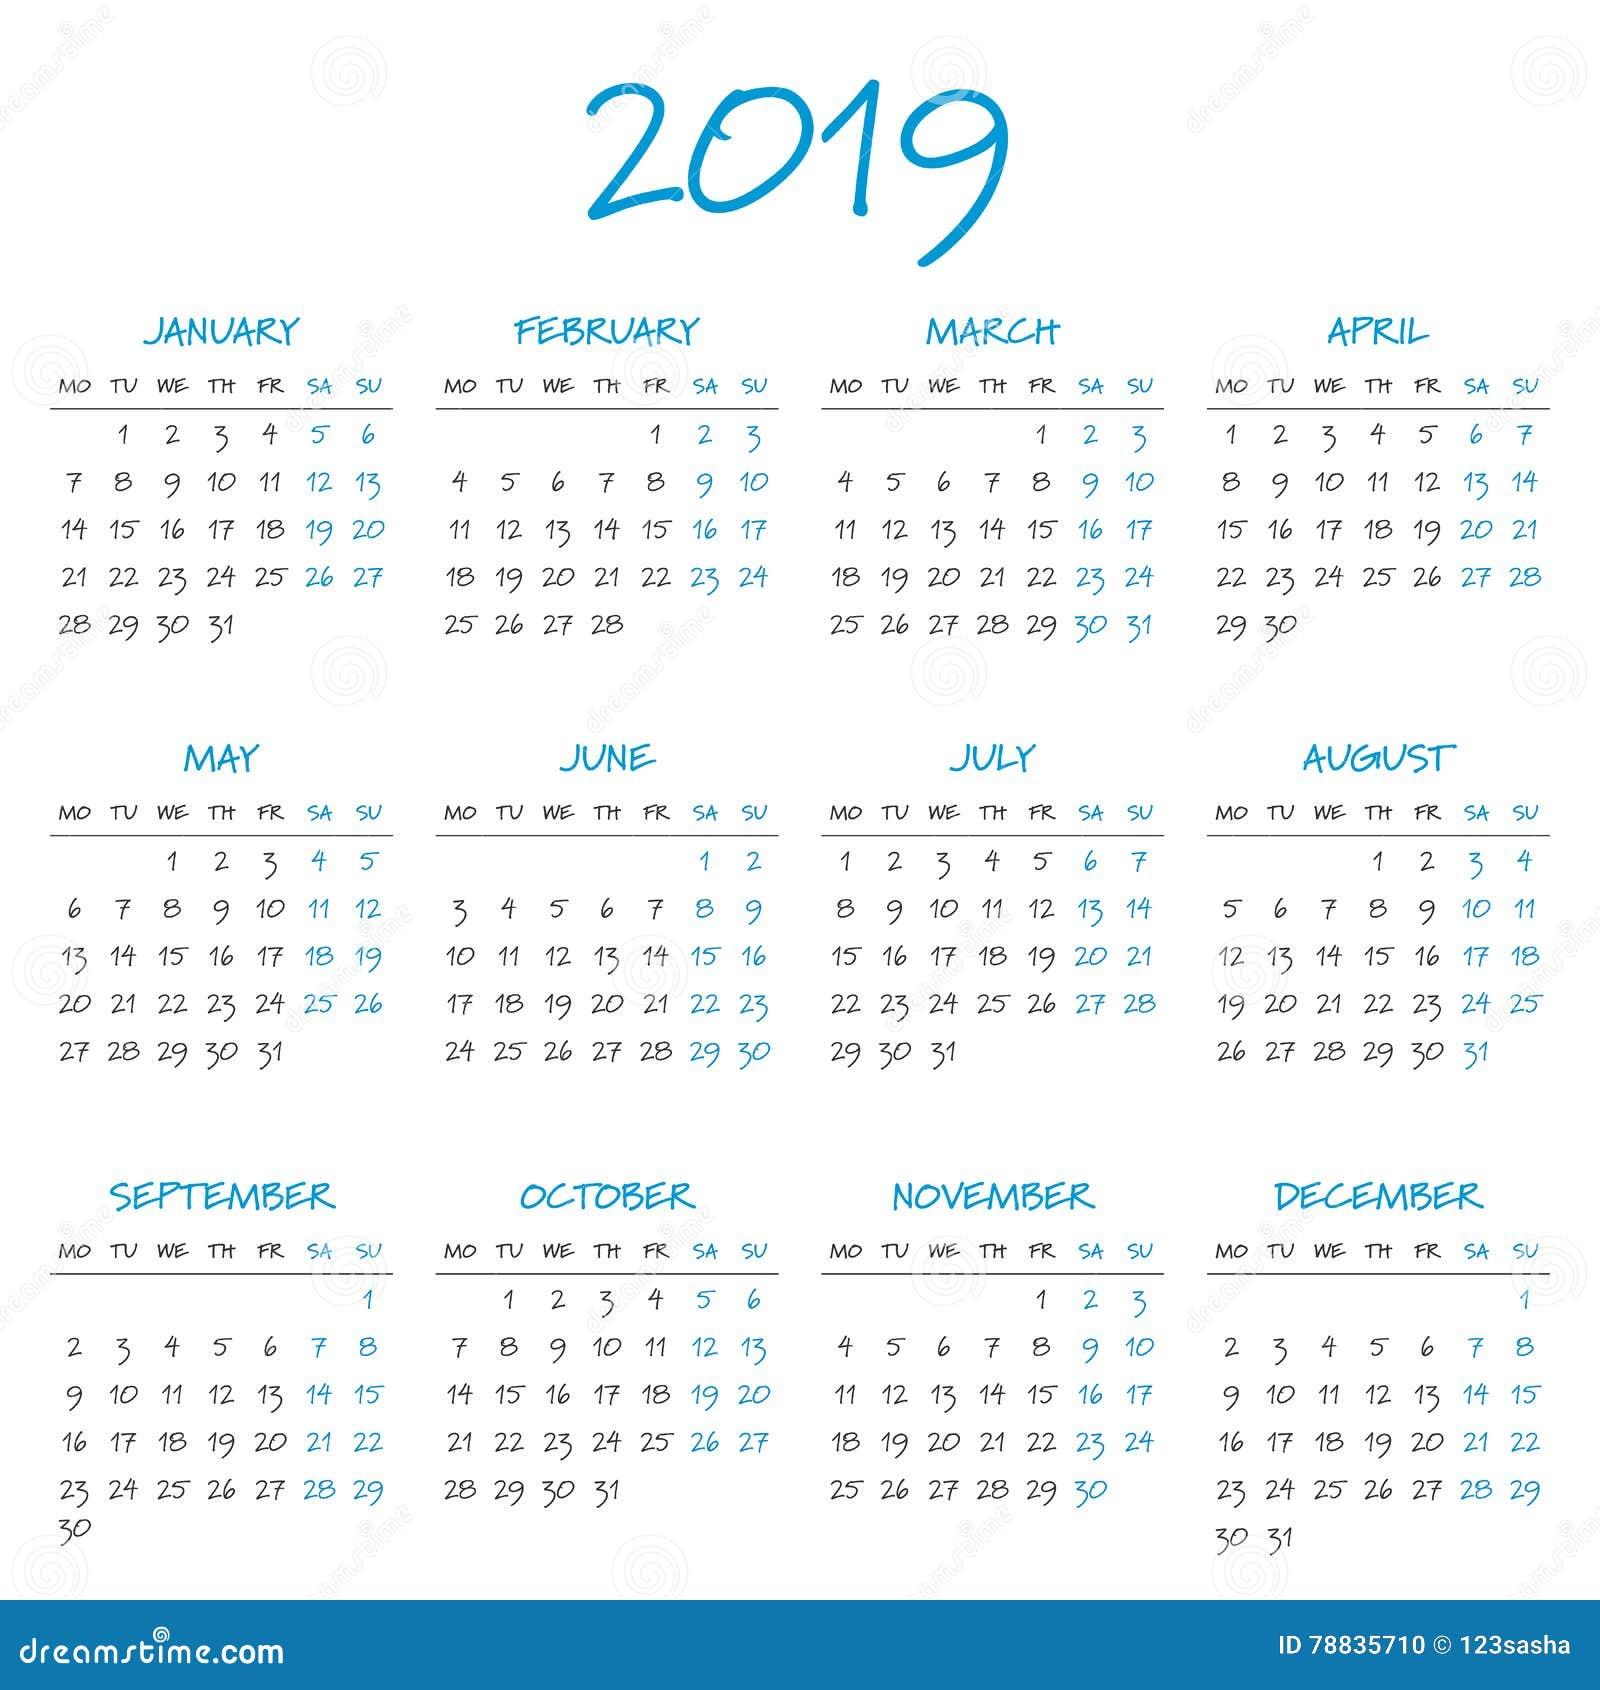 start em 2019